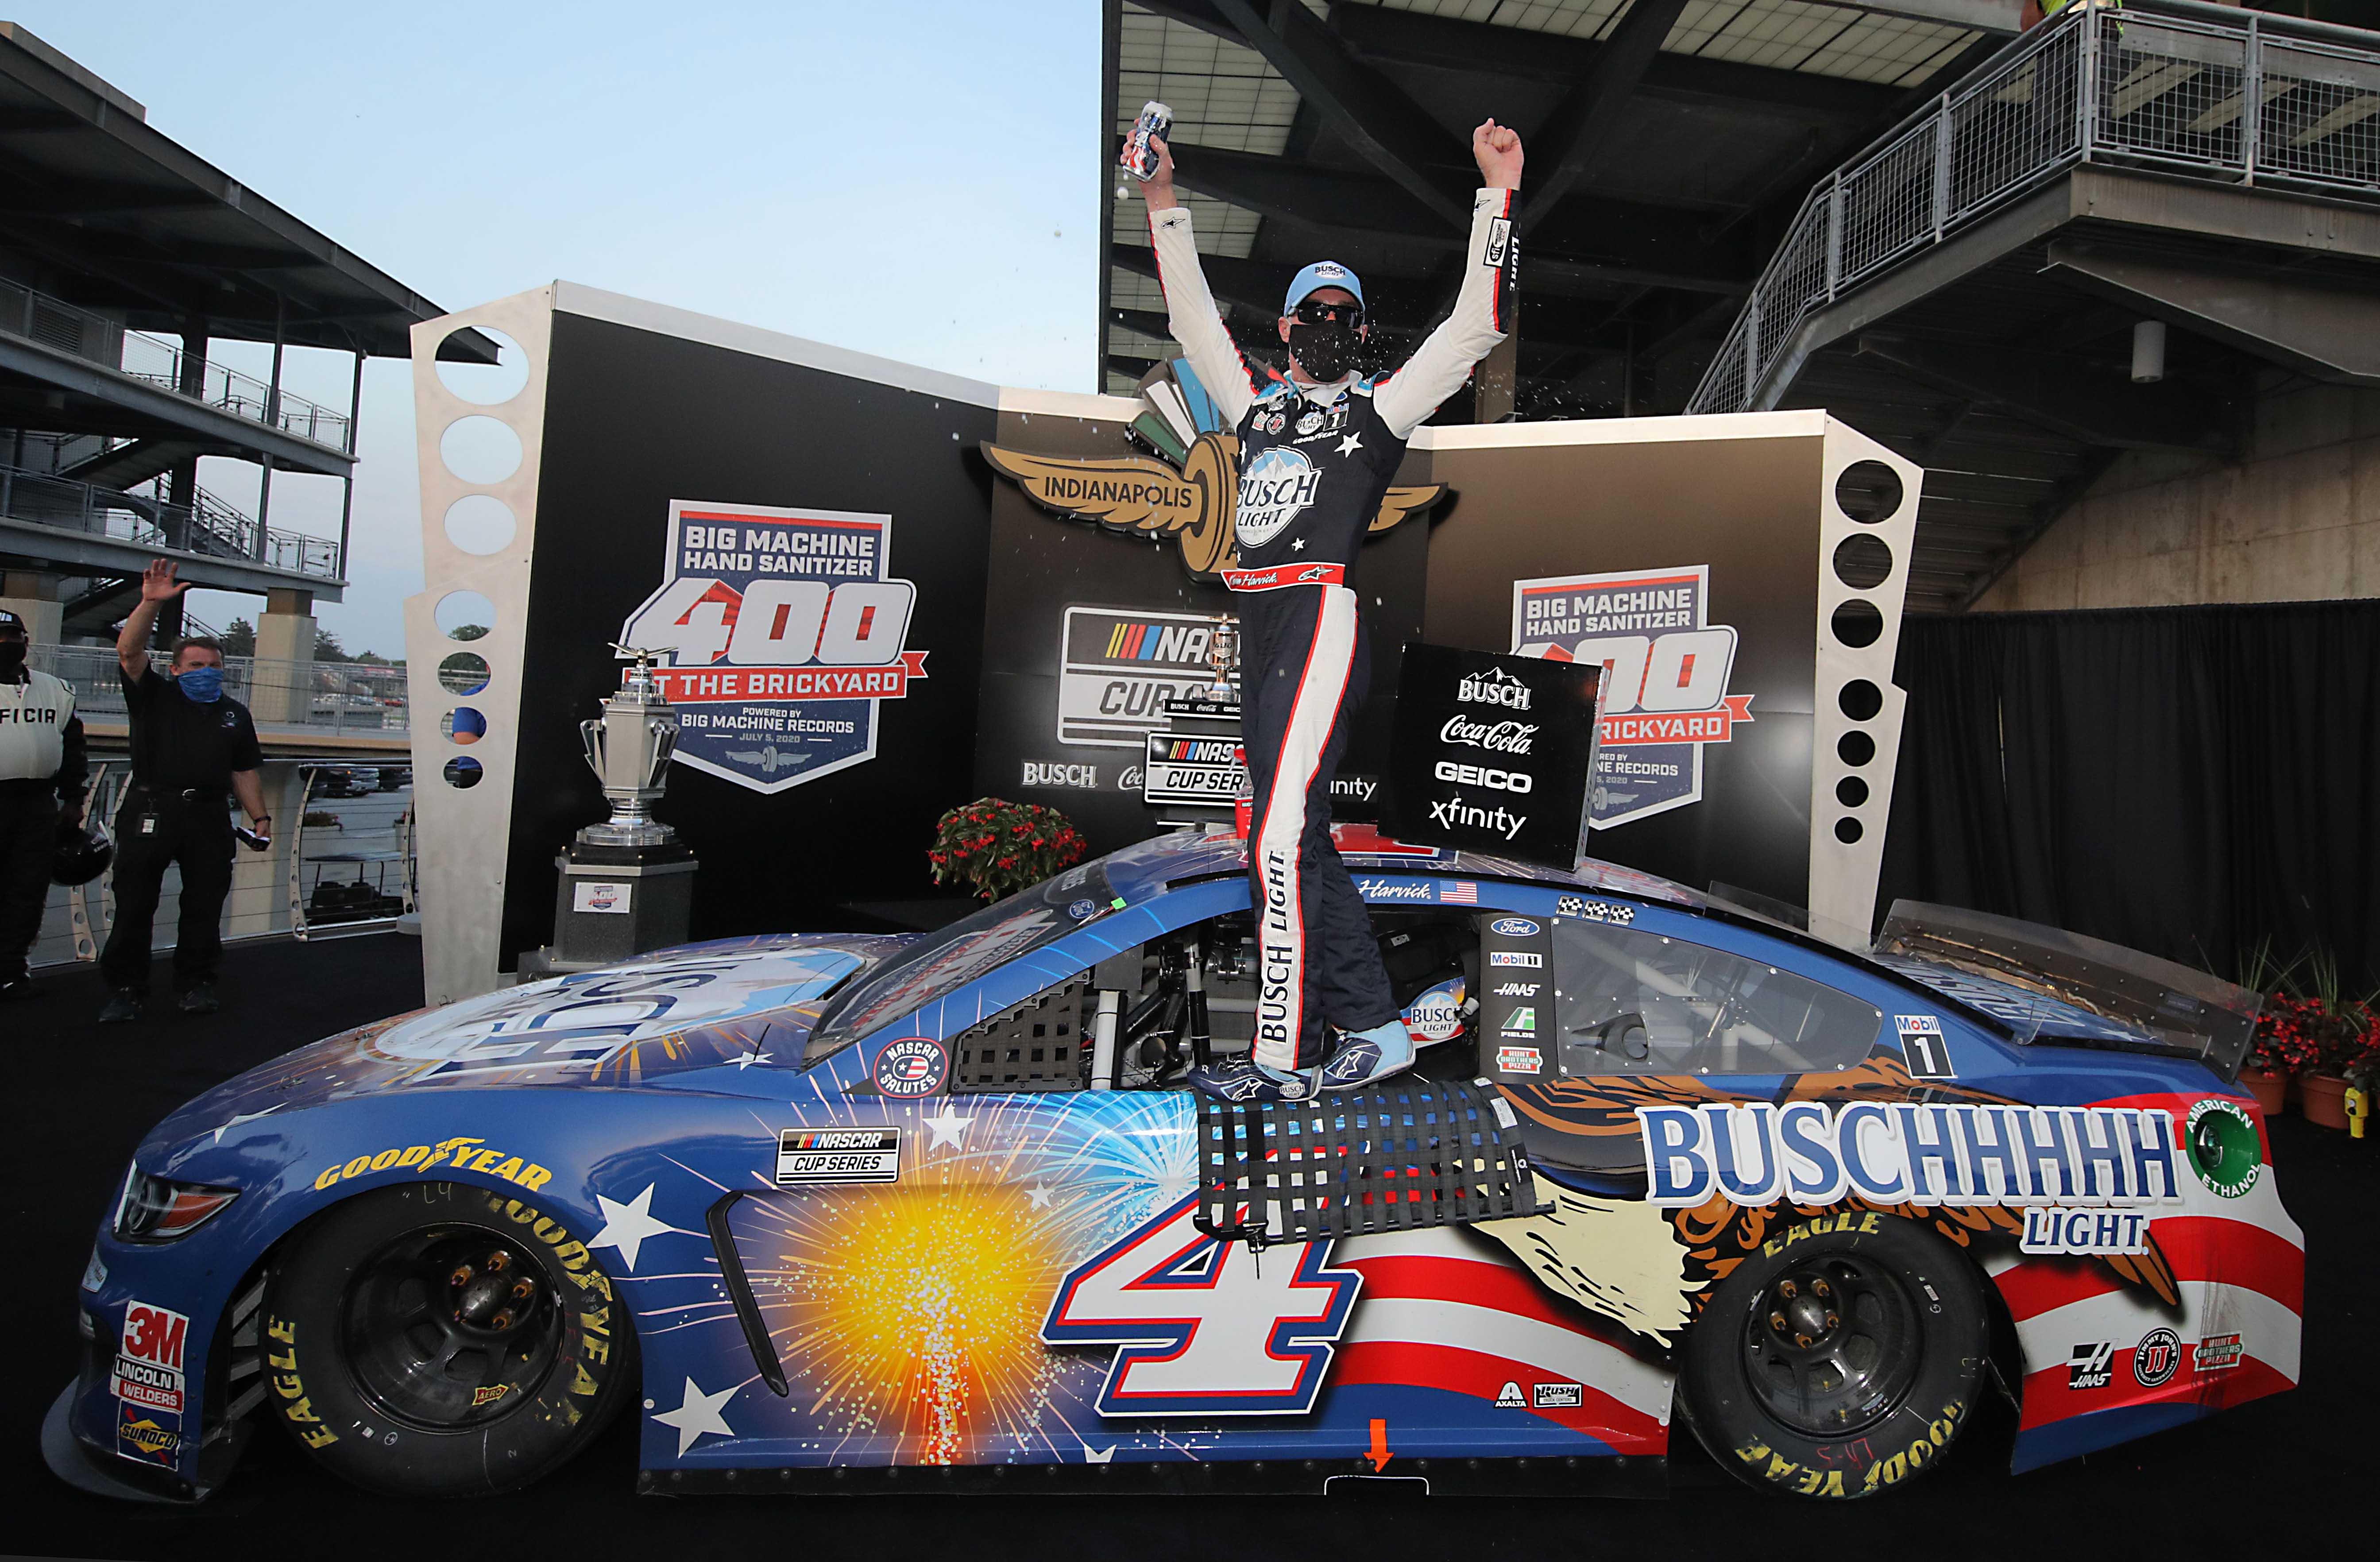 Indianapolis TV Ratings: July 2020 - Racing News